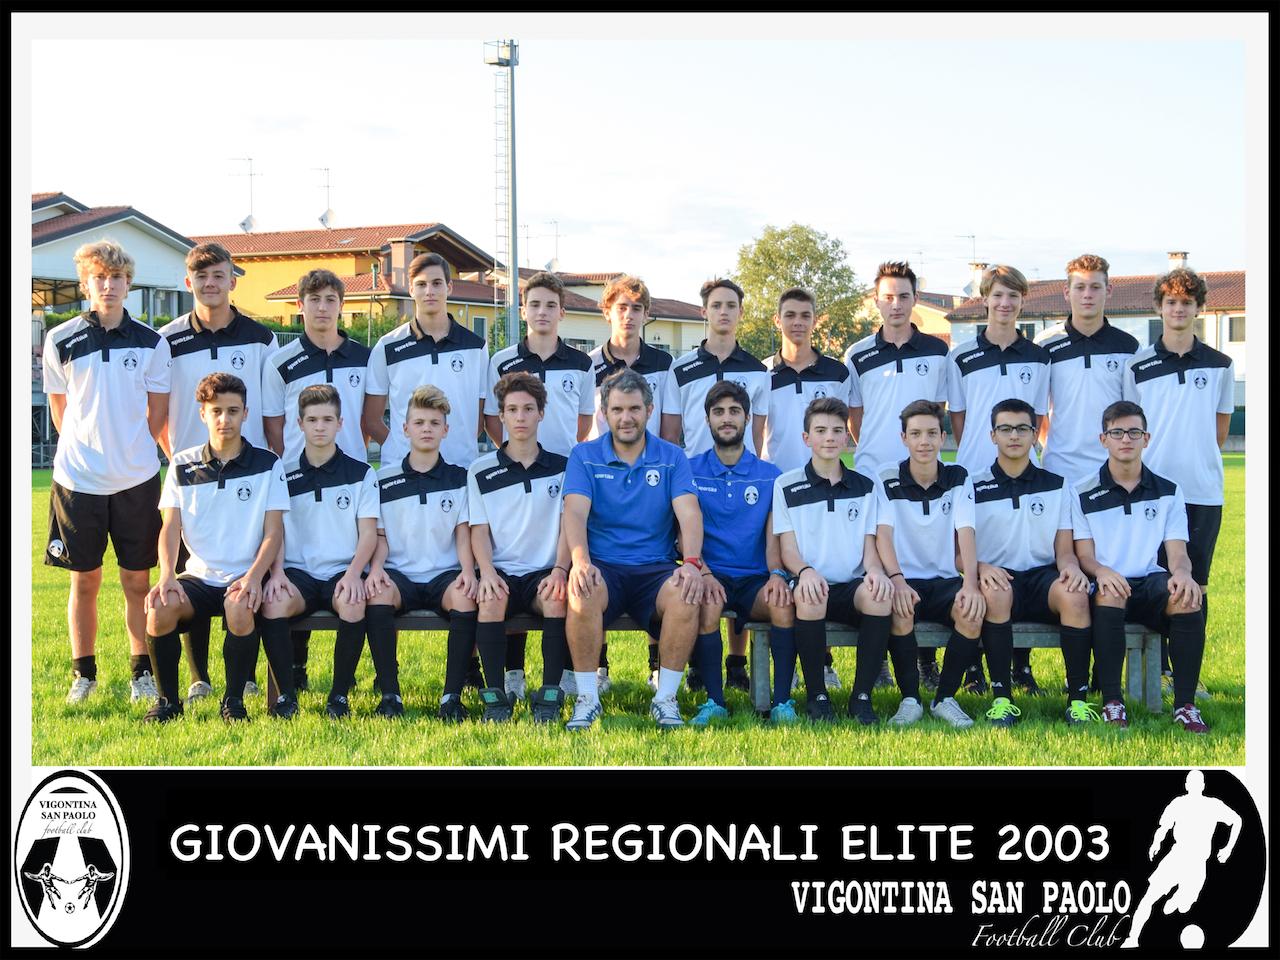 2003 Giovanissimi Regionali Elite